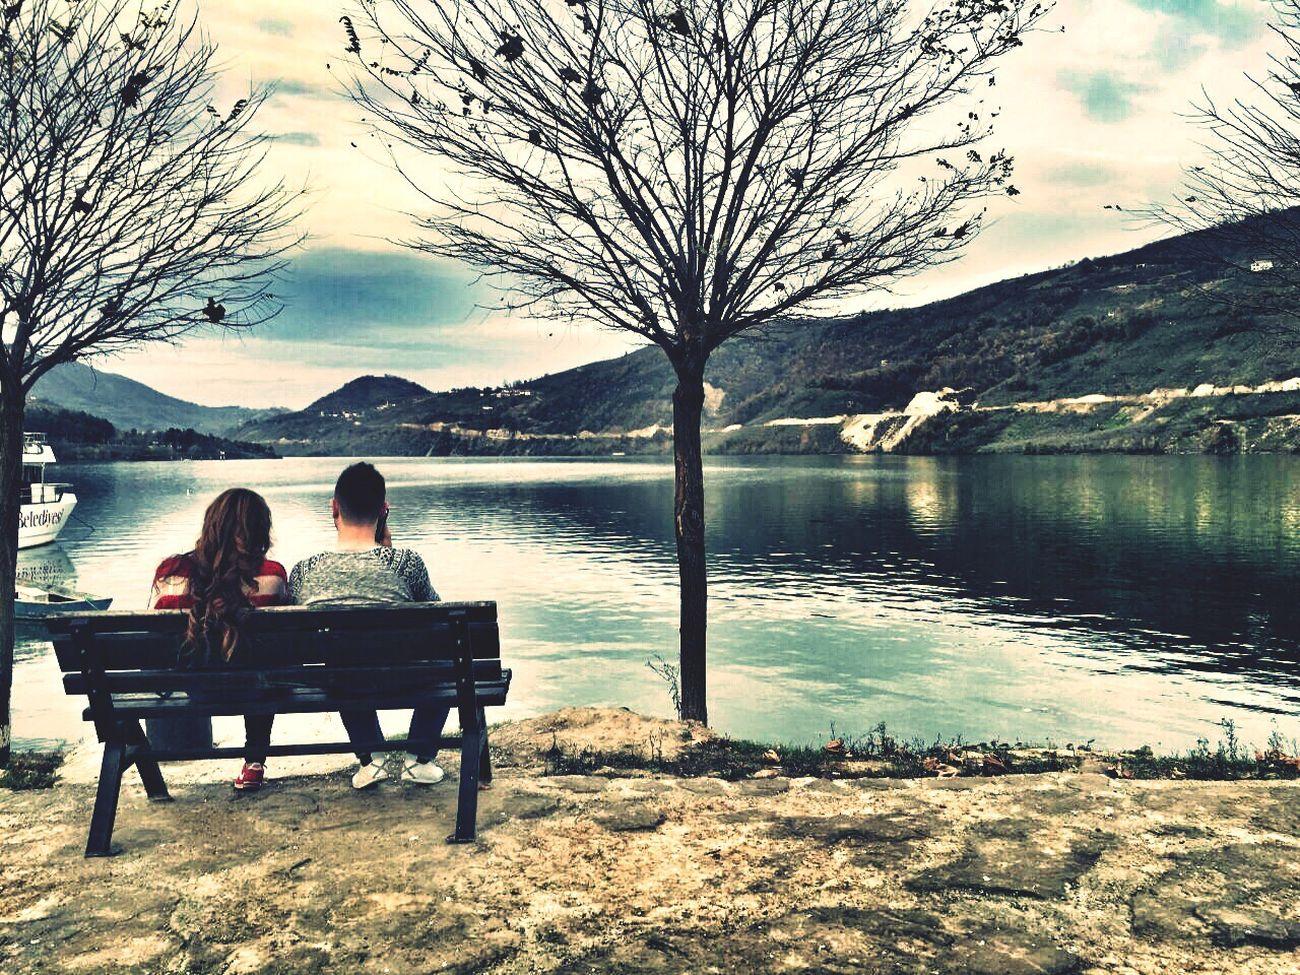 Zamanidurdur Sessizce Huzura Doğru😉 Women Around The World